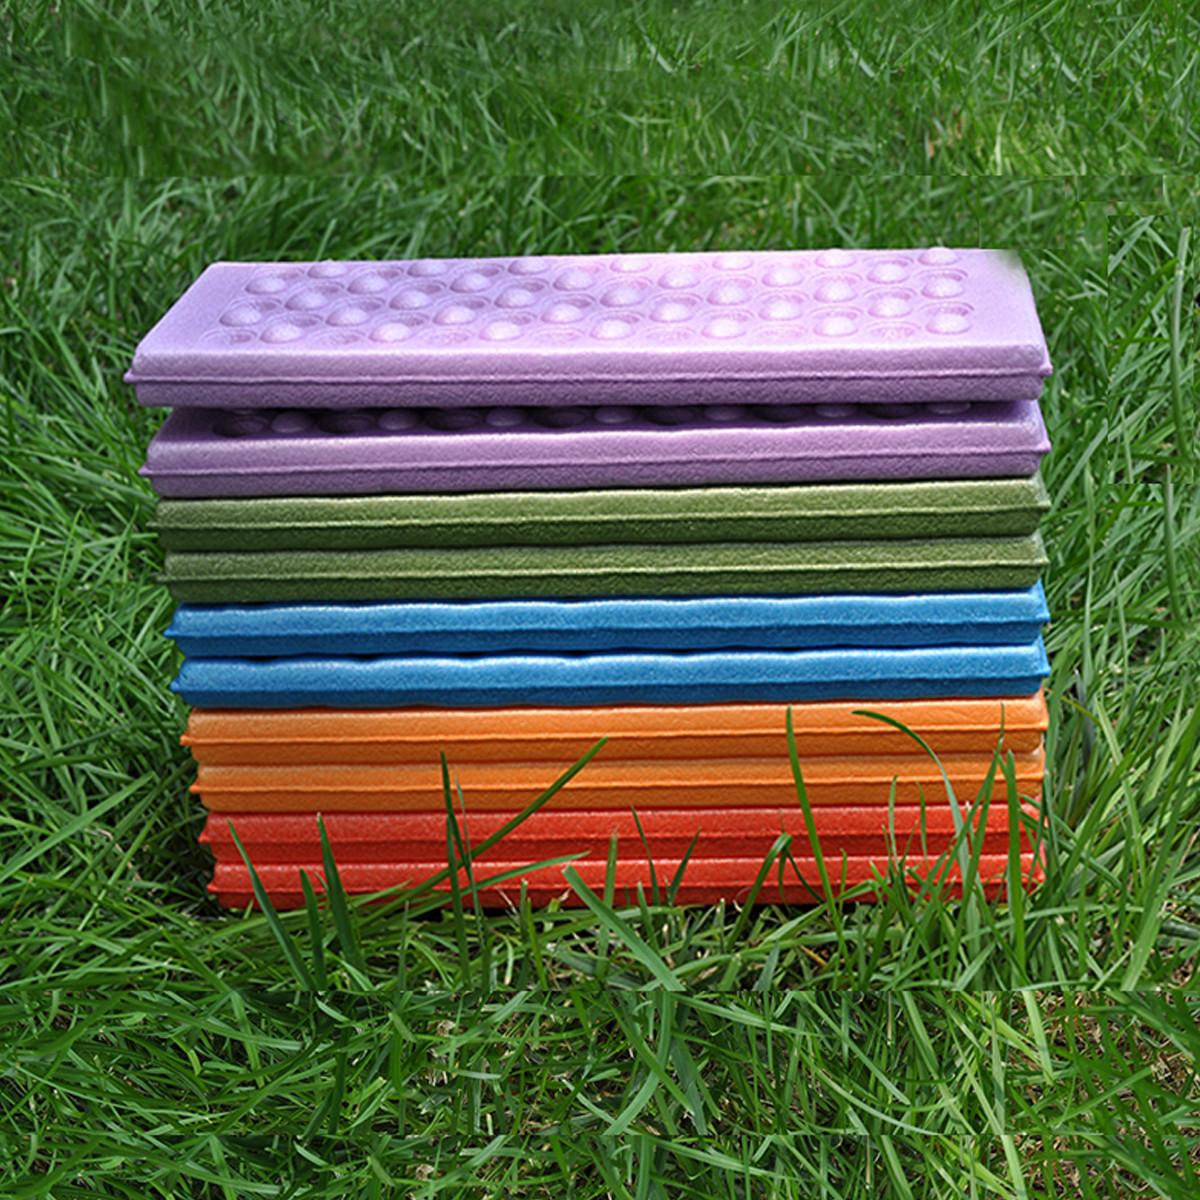 Foldable XPE Outdoor Seat Cushion Foam Chair Waterproof Mat Picnic Camping Pa